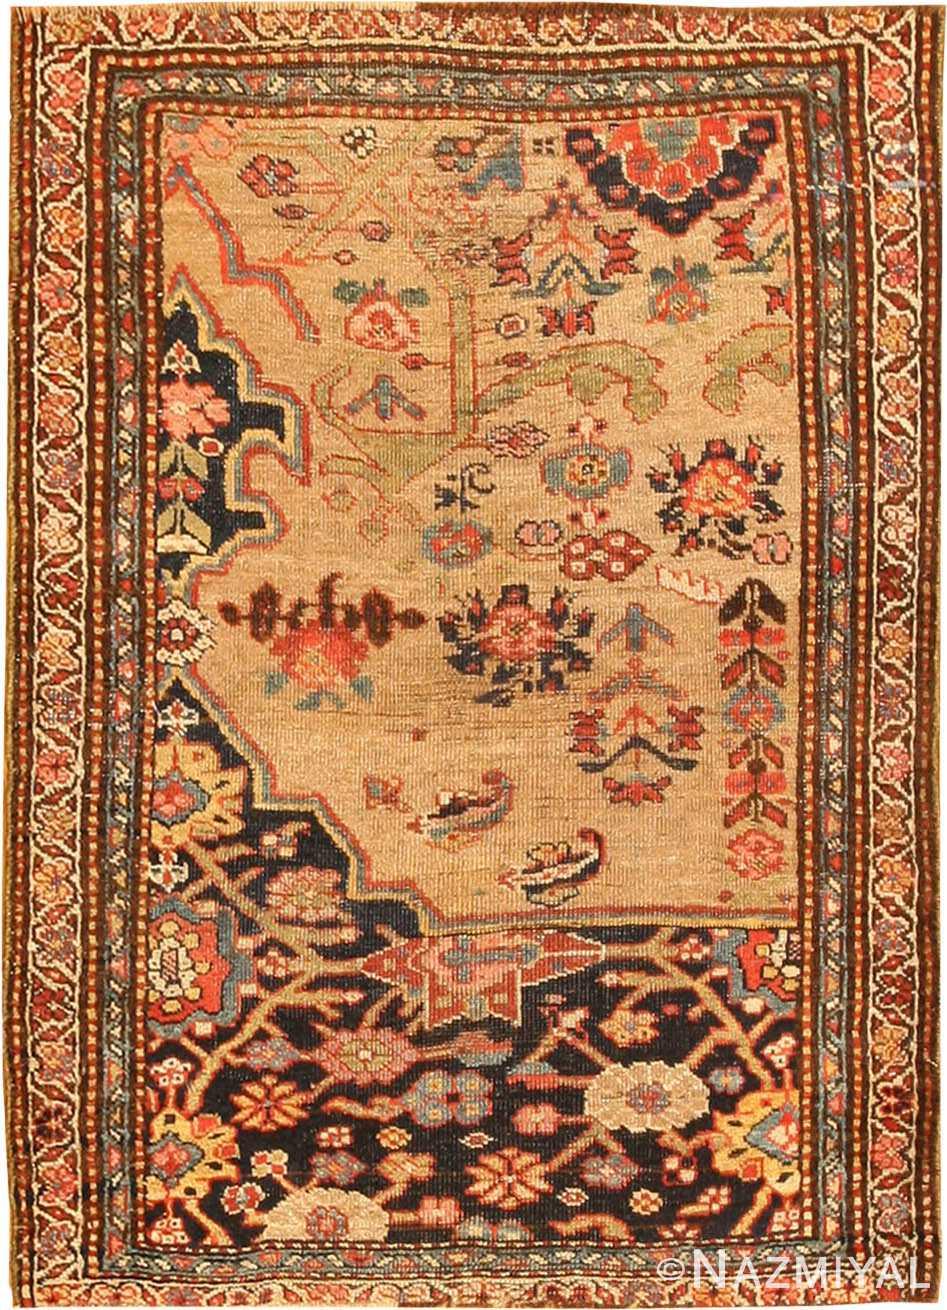 Antique Bidjar Persian Rug 42815 Detail/Large View